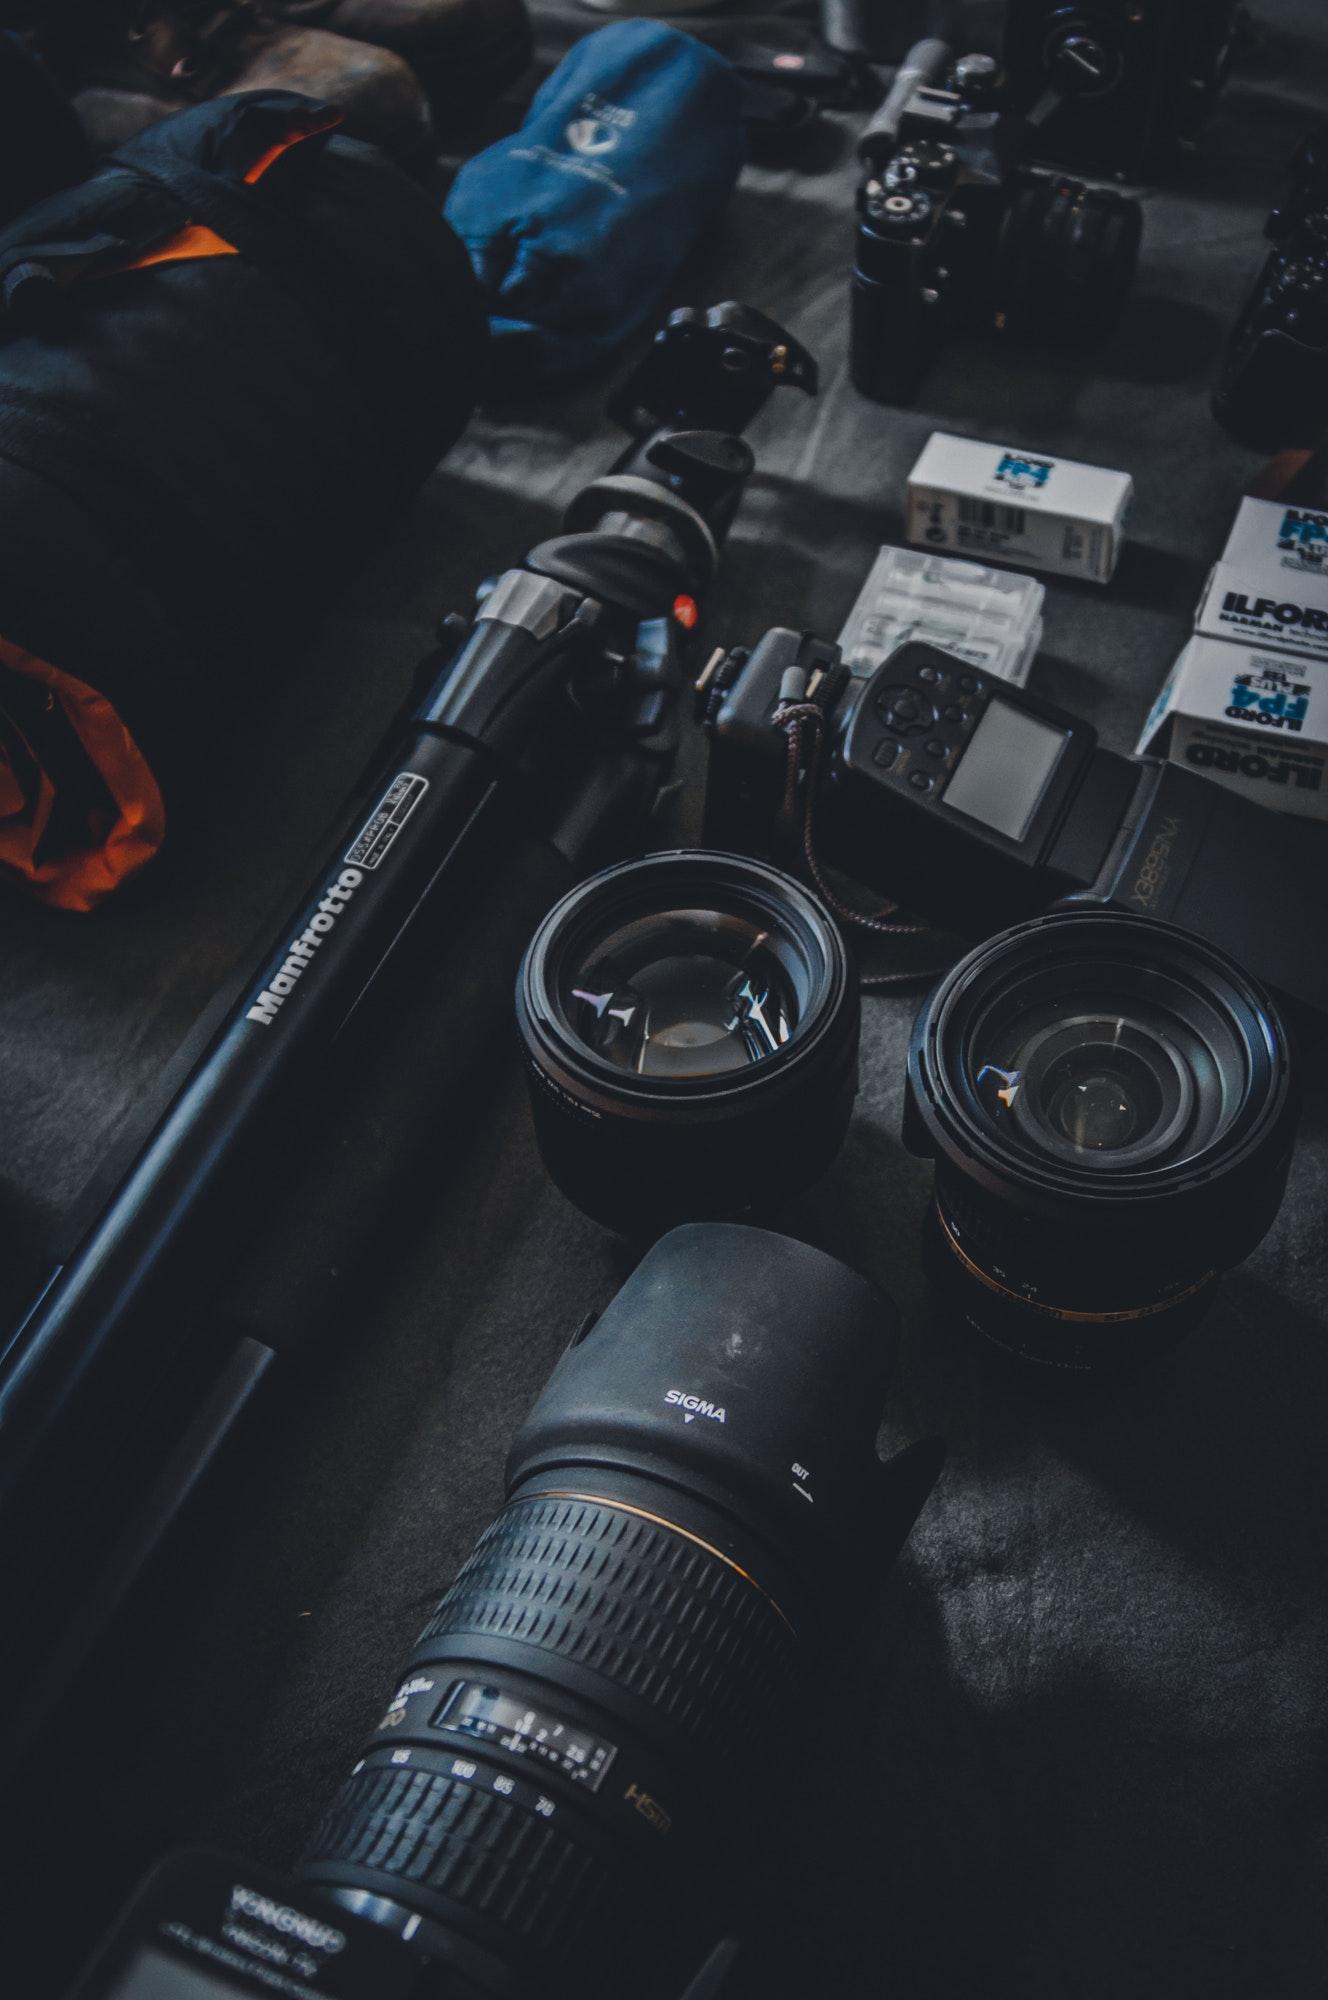 Selective Focus Photography of Dslr Camera Parts, Photography, Parts, Technology, Optics, HQ Photo